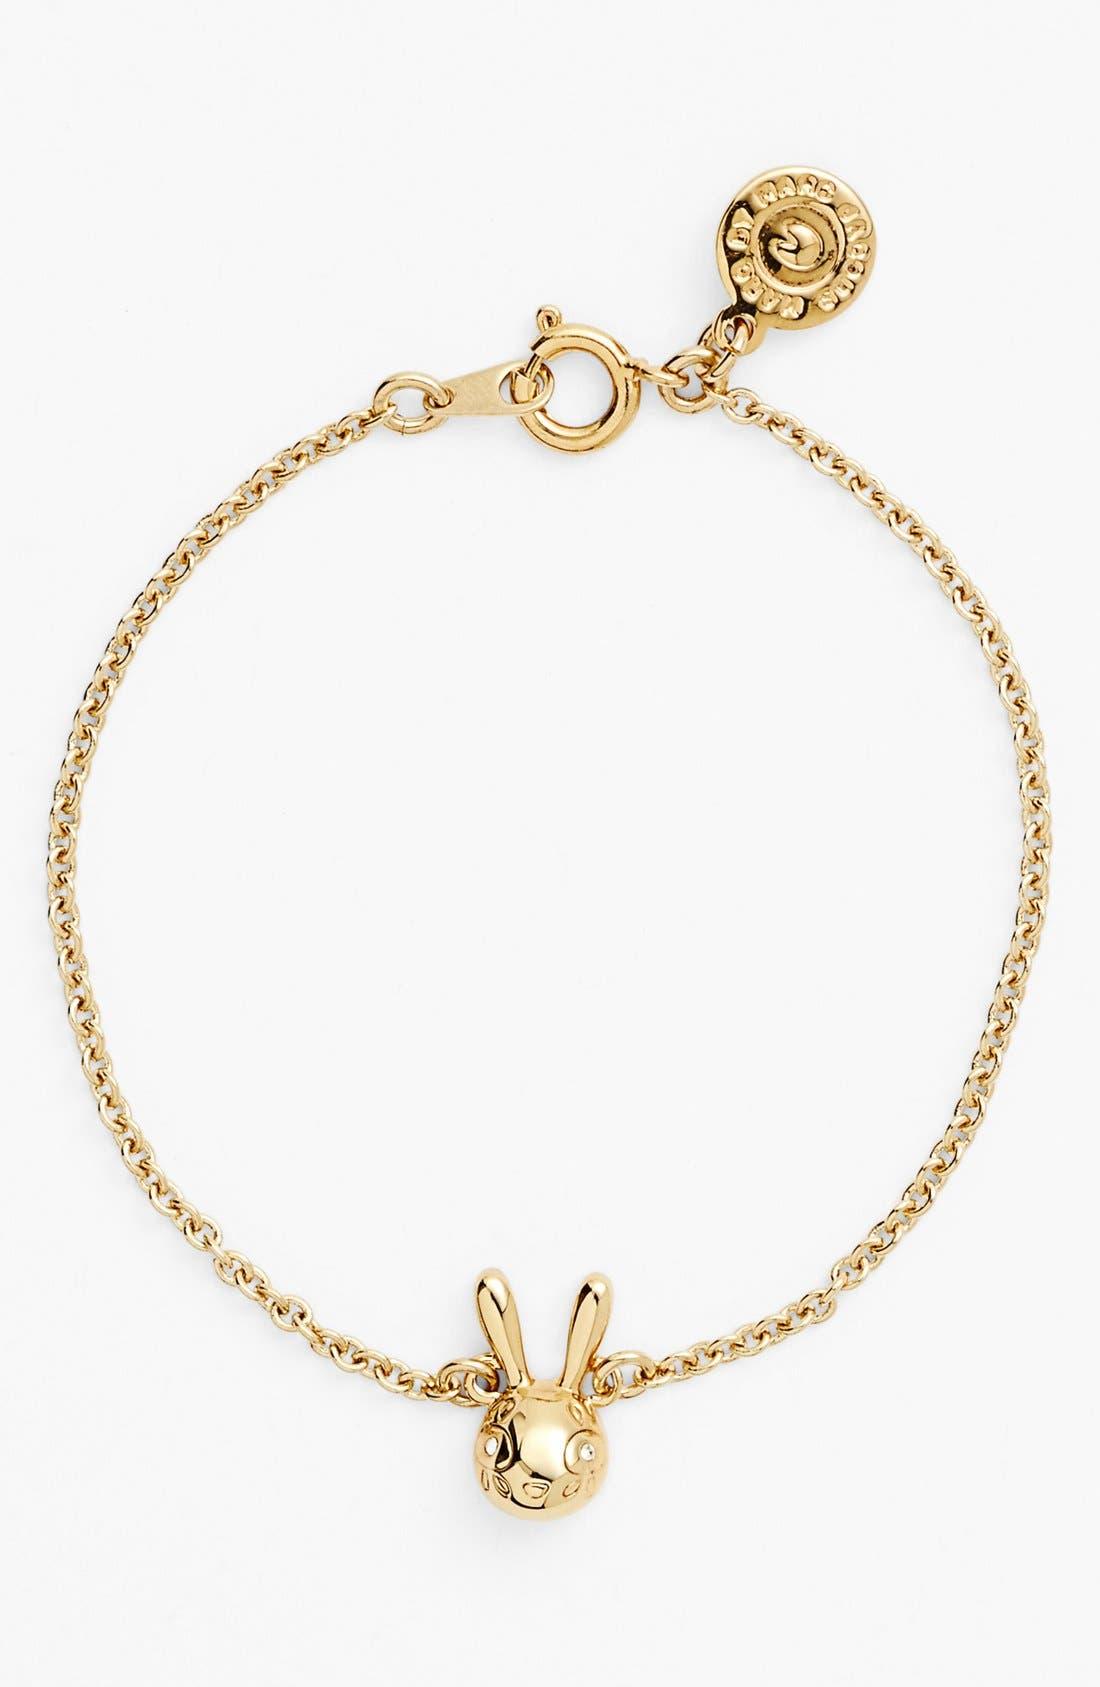 Main Image - MARC BY MARC JACOBS 'Dynamite' Bunny Line Bracelet